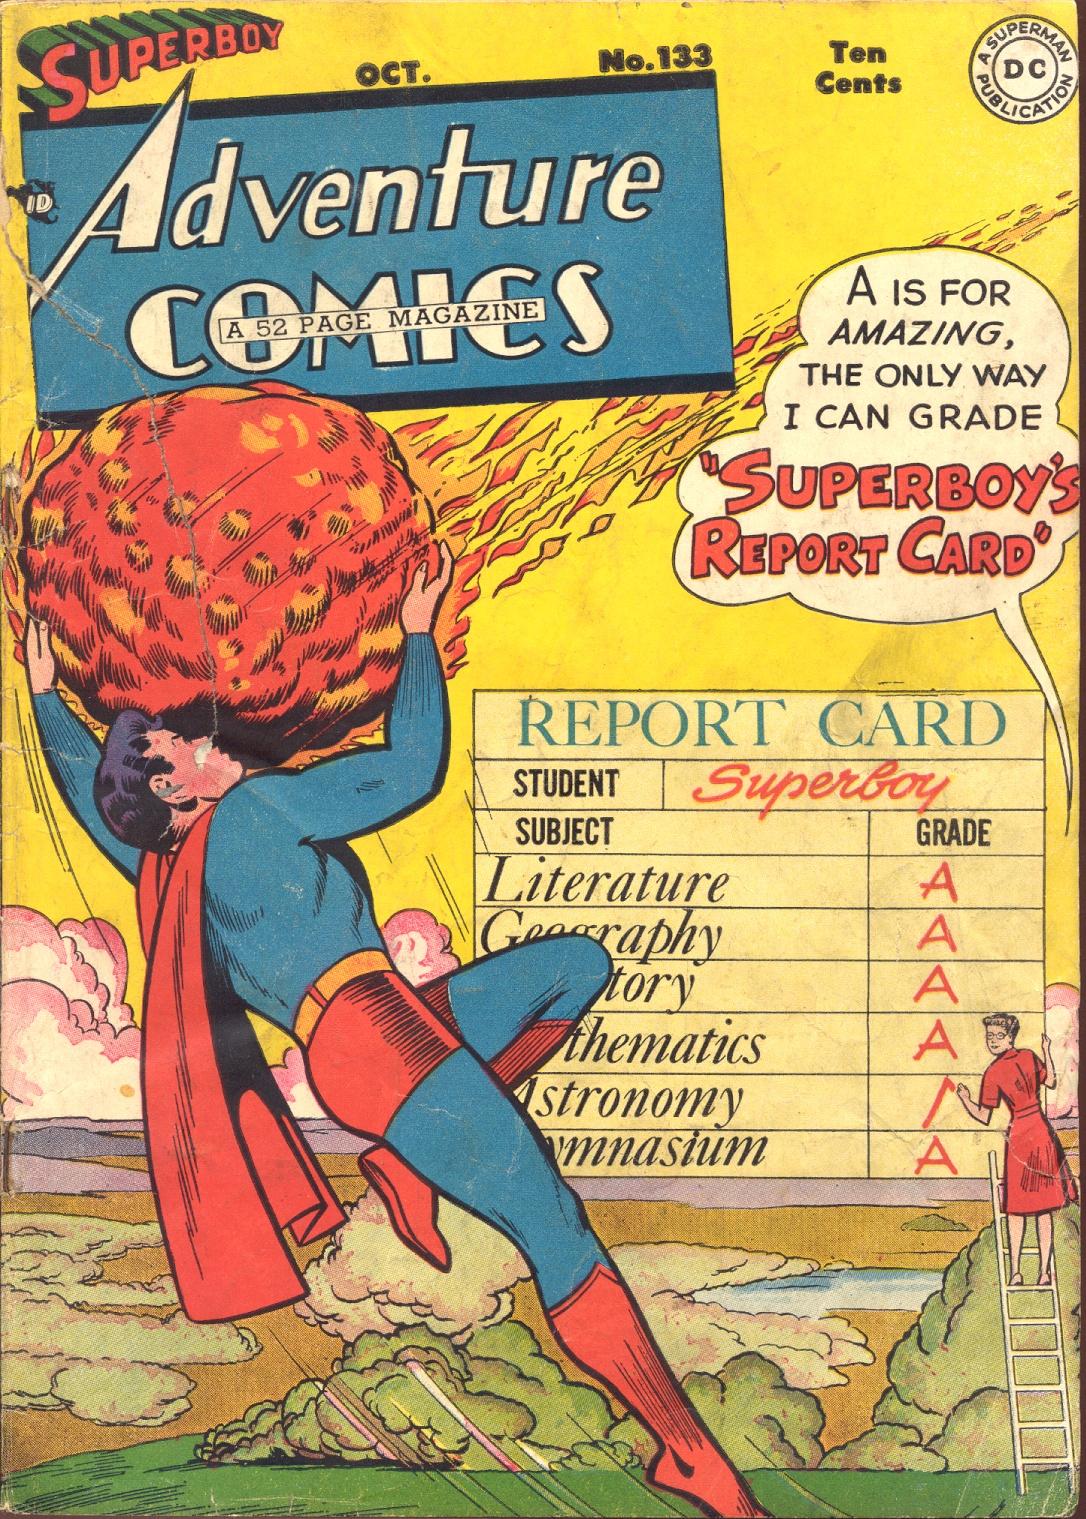 Read online Adventure Comics (1938) comic -  Issue #133 - 1